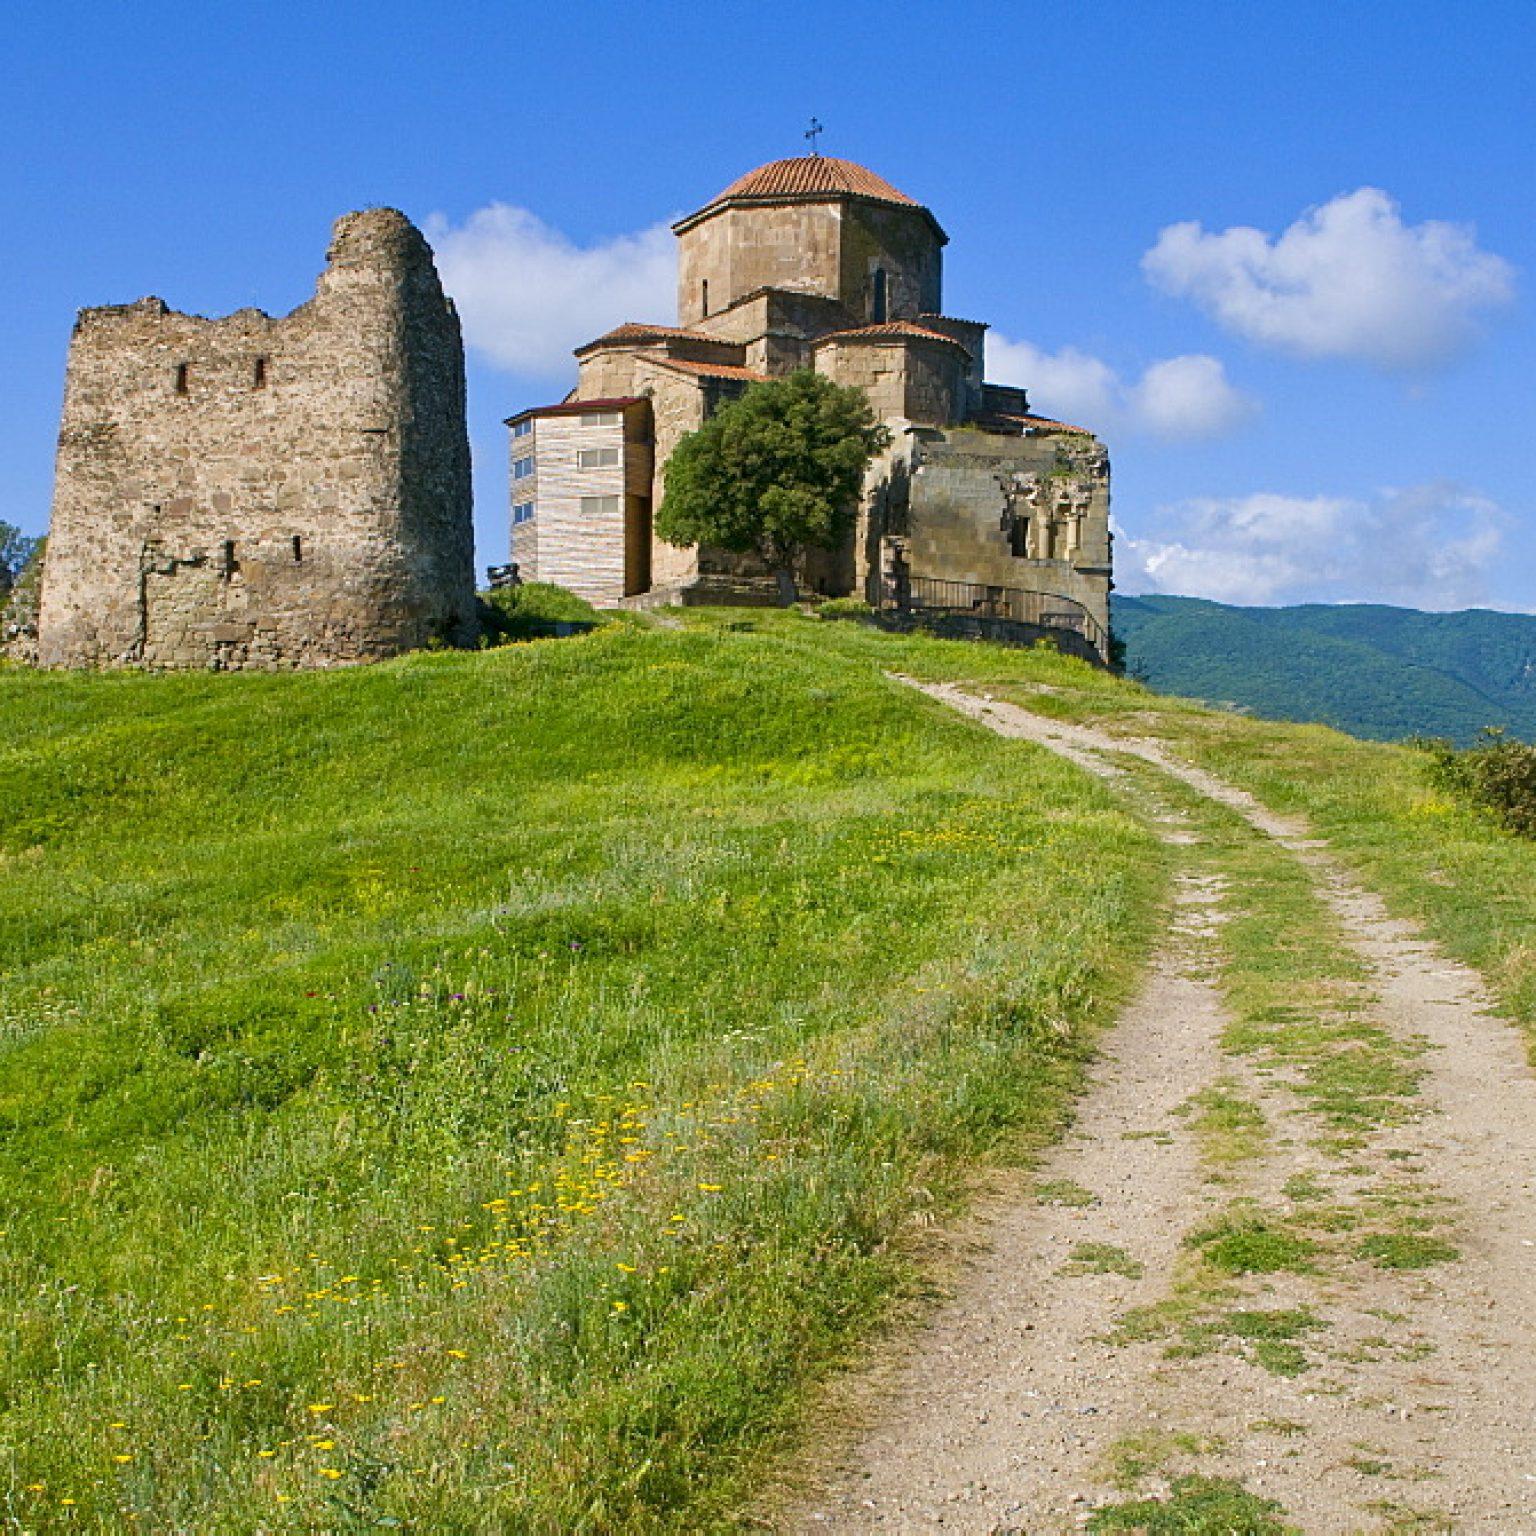 The church of Jvari, Mtskheta, UNESCO World Heritage Site, Georgia, Caucasus, Central Asia, Asia